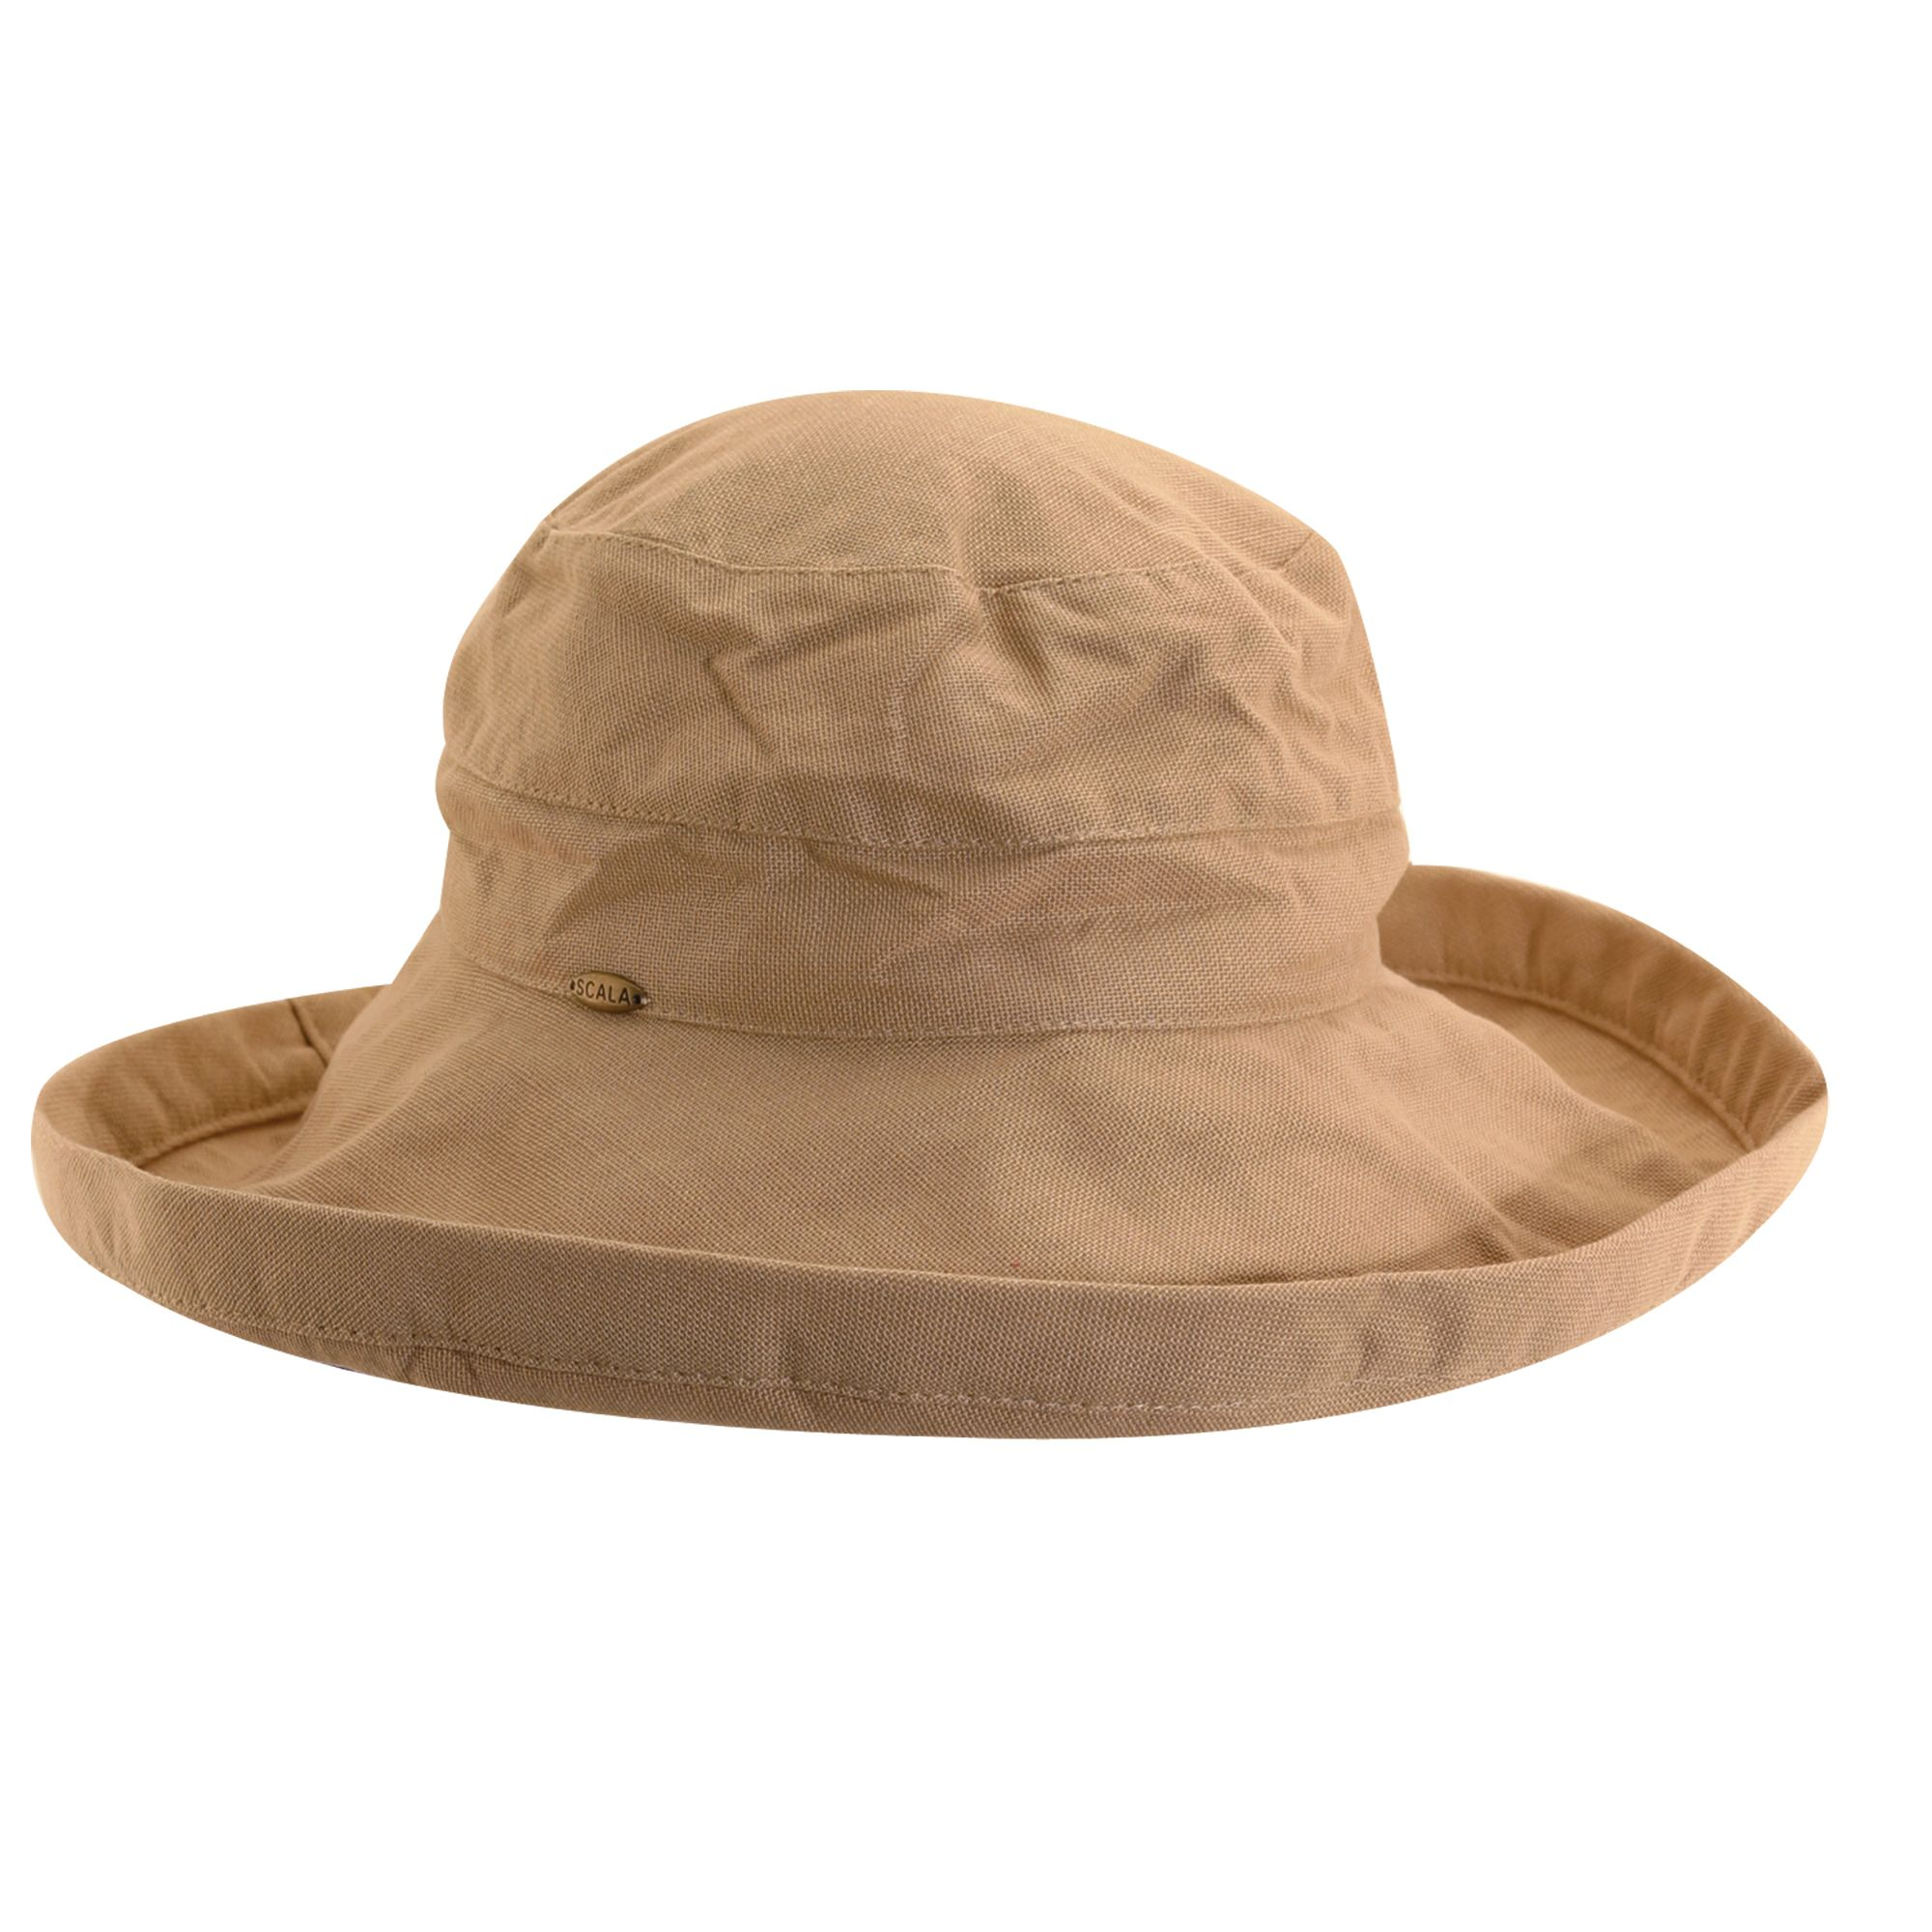 Scala Women s Cotton 4 Inch Brim UPF 50+ Travel Sun Hat  fa9af42e39a